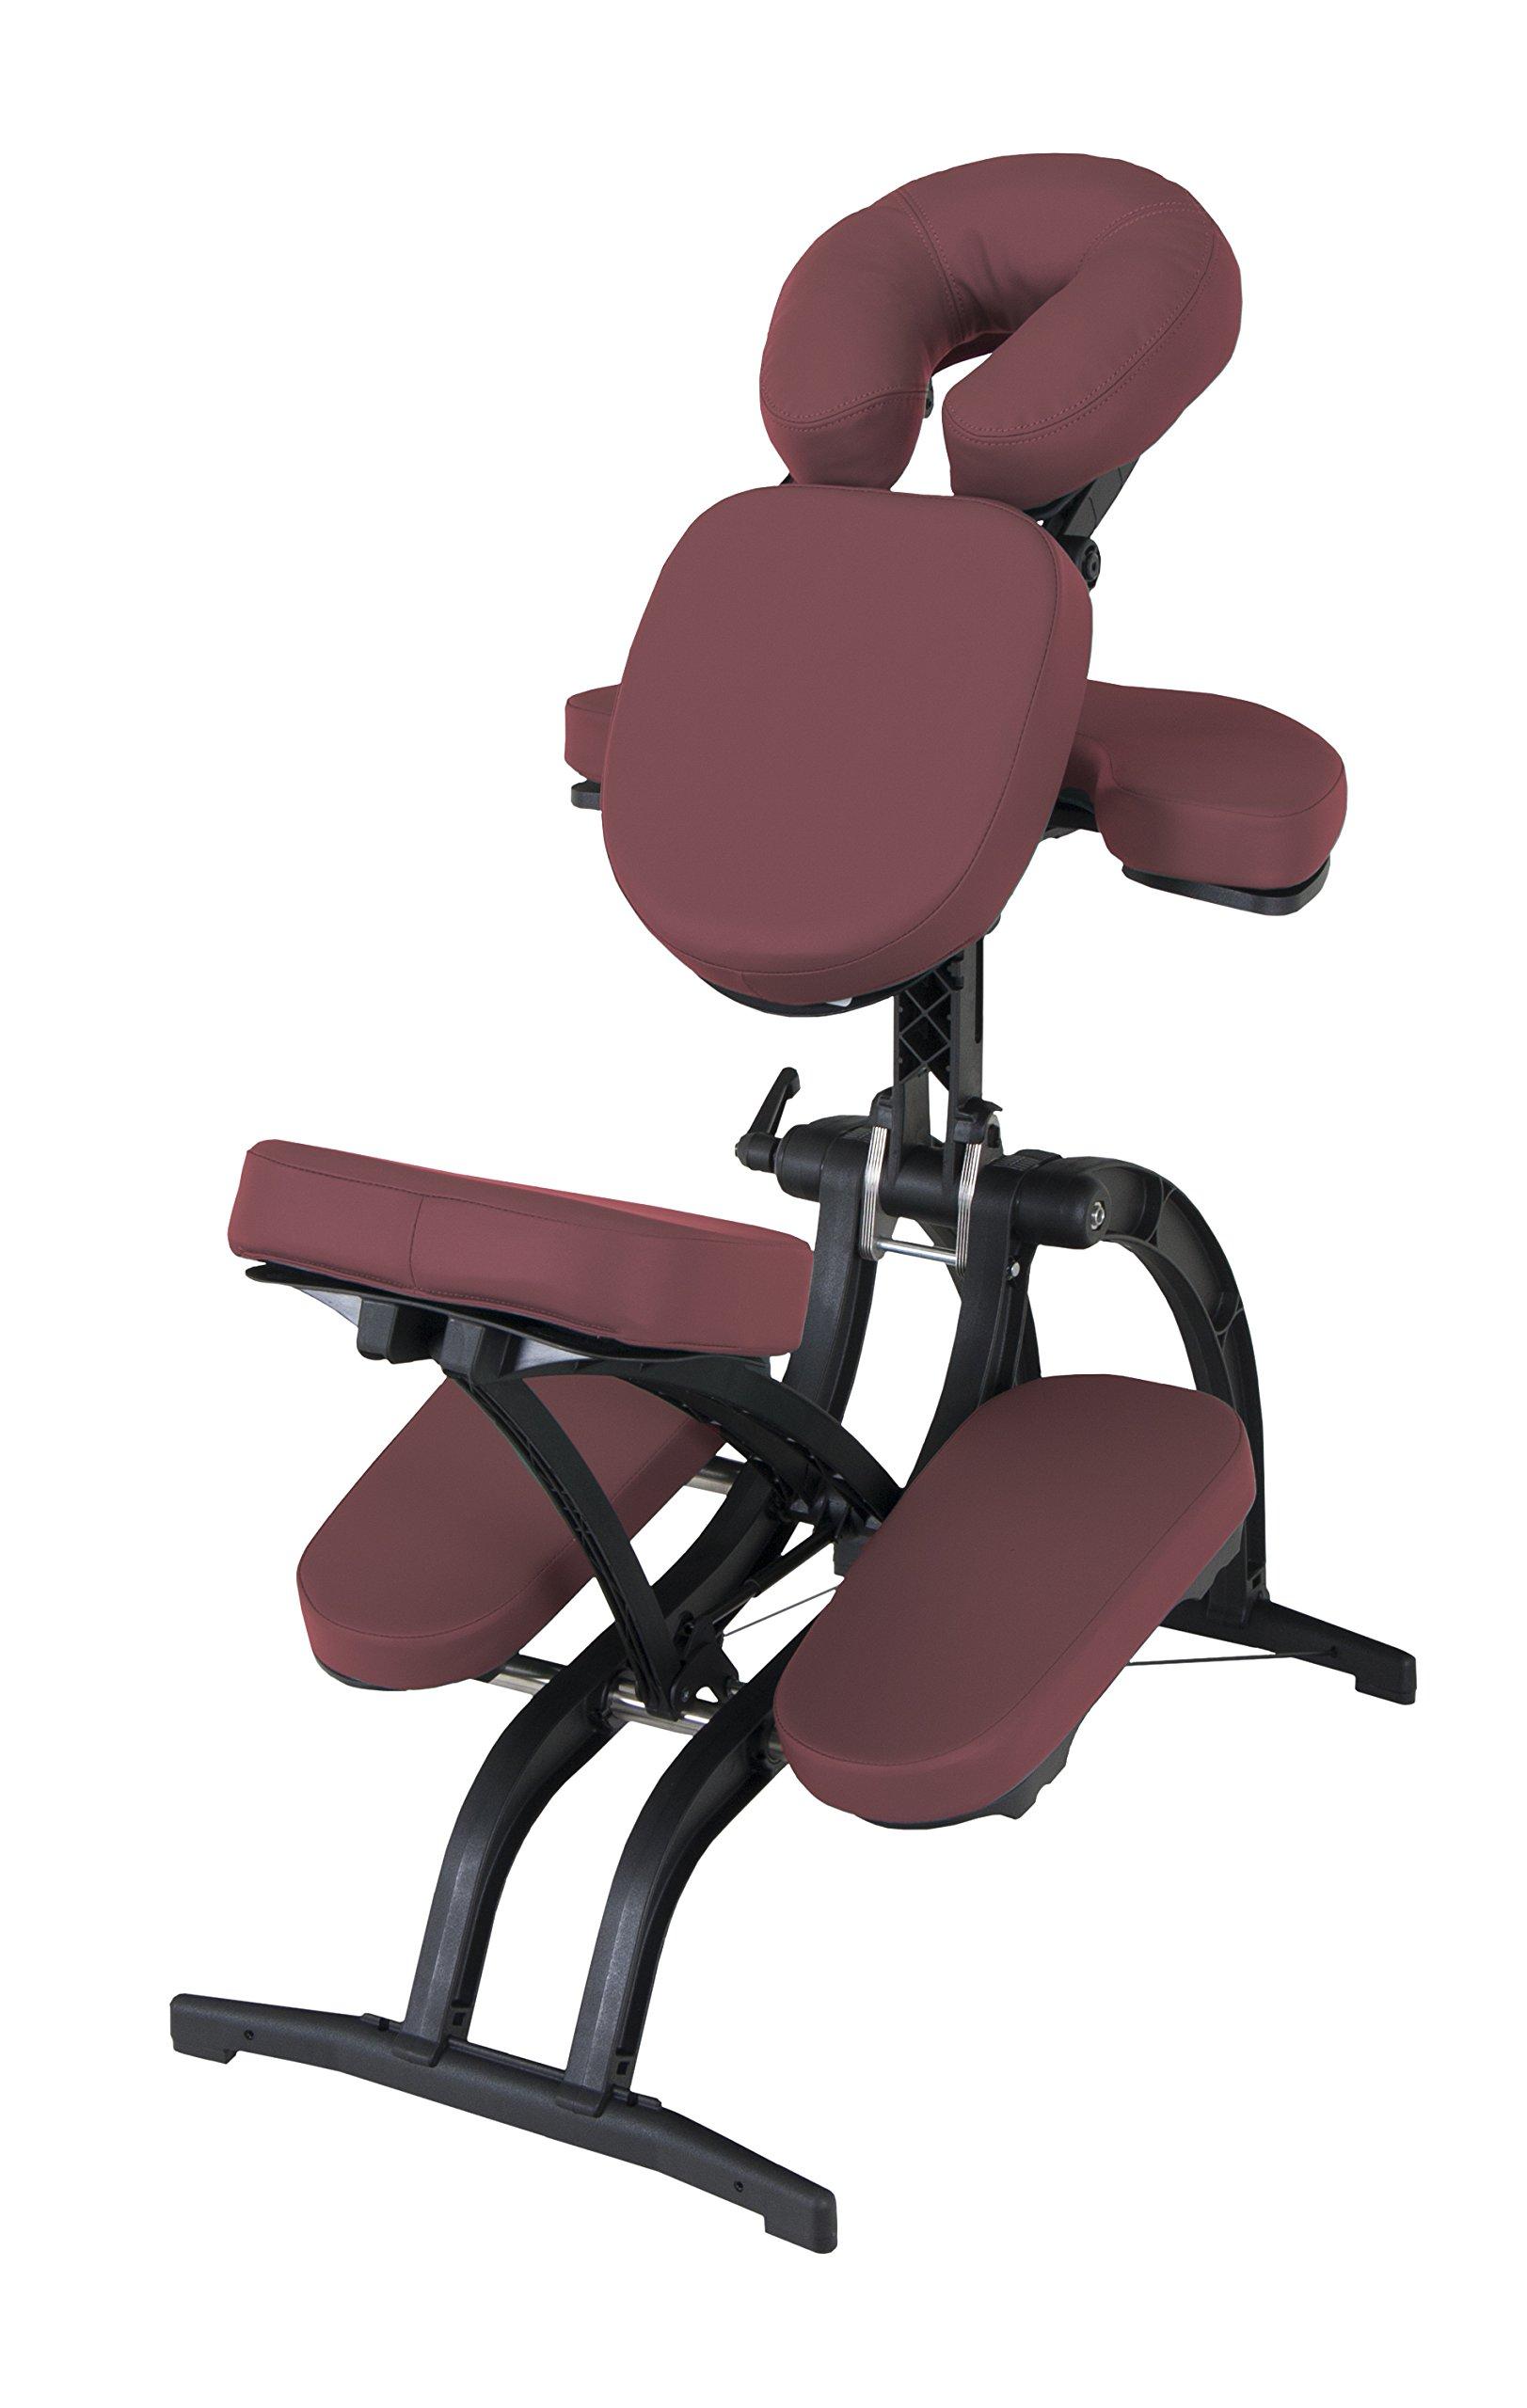 EARTHLITE Avila II Portable Massage Chair Package Folding Tattoo